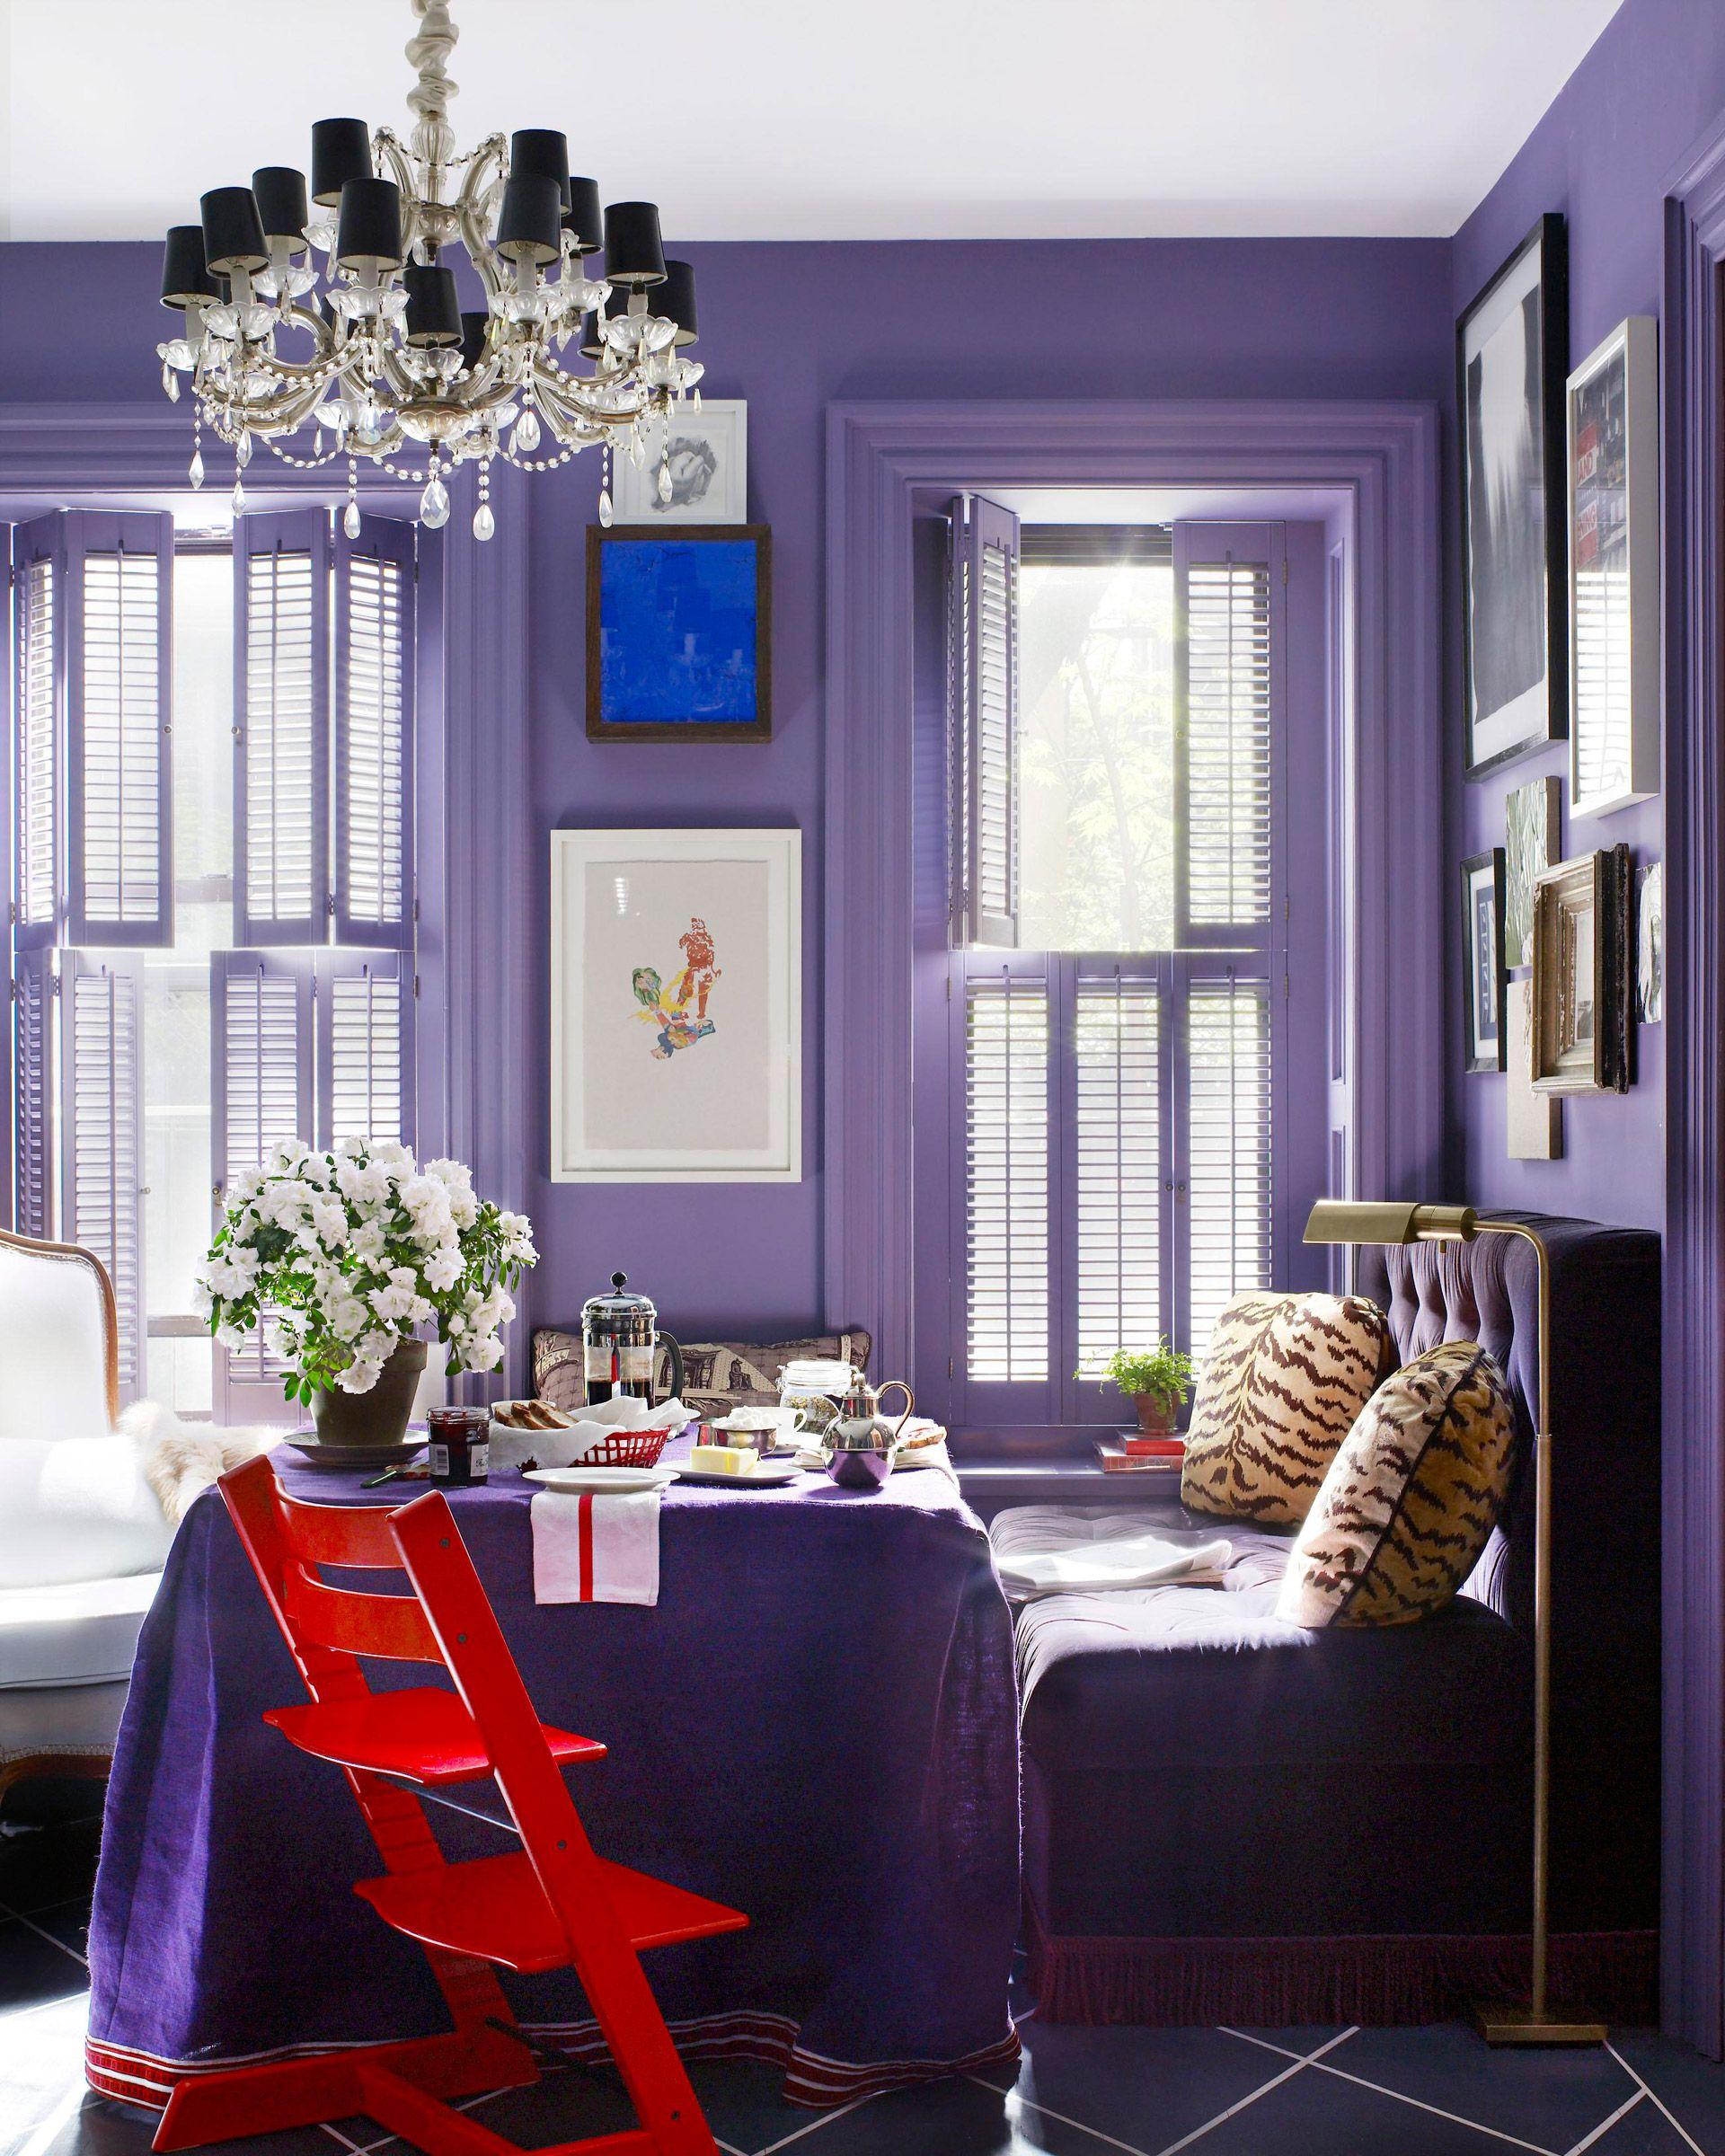 Living Room Violet Color 18 best purple rooms - lavender, lilac and violet decorating ideas